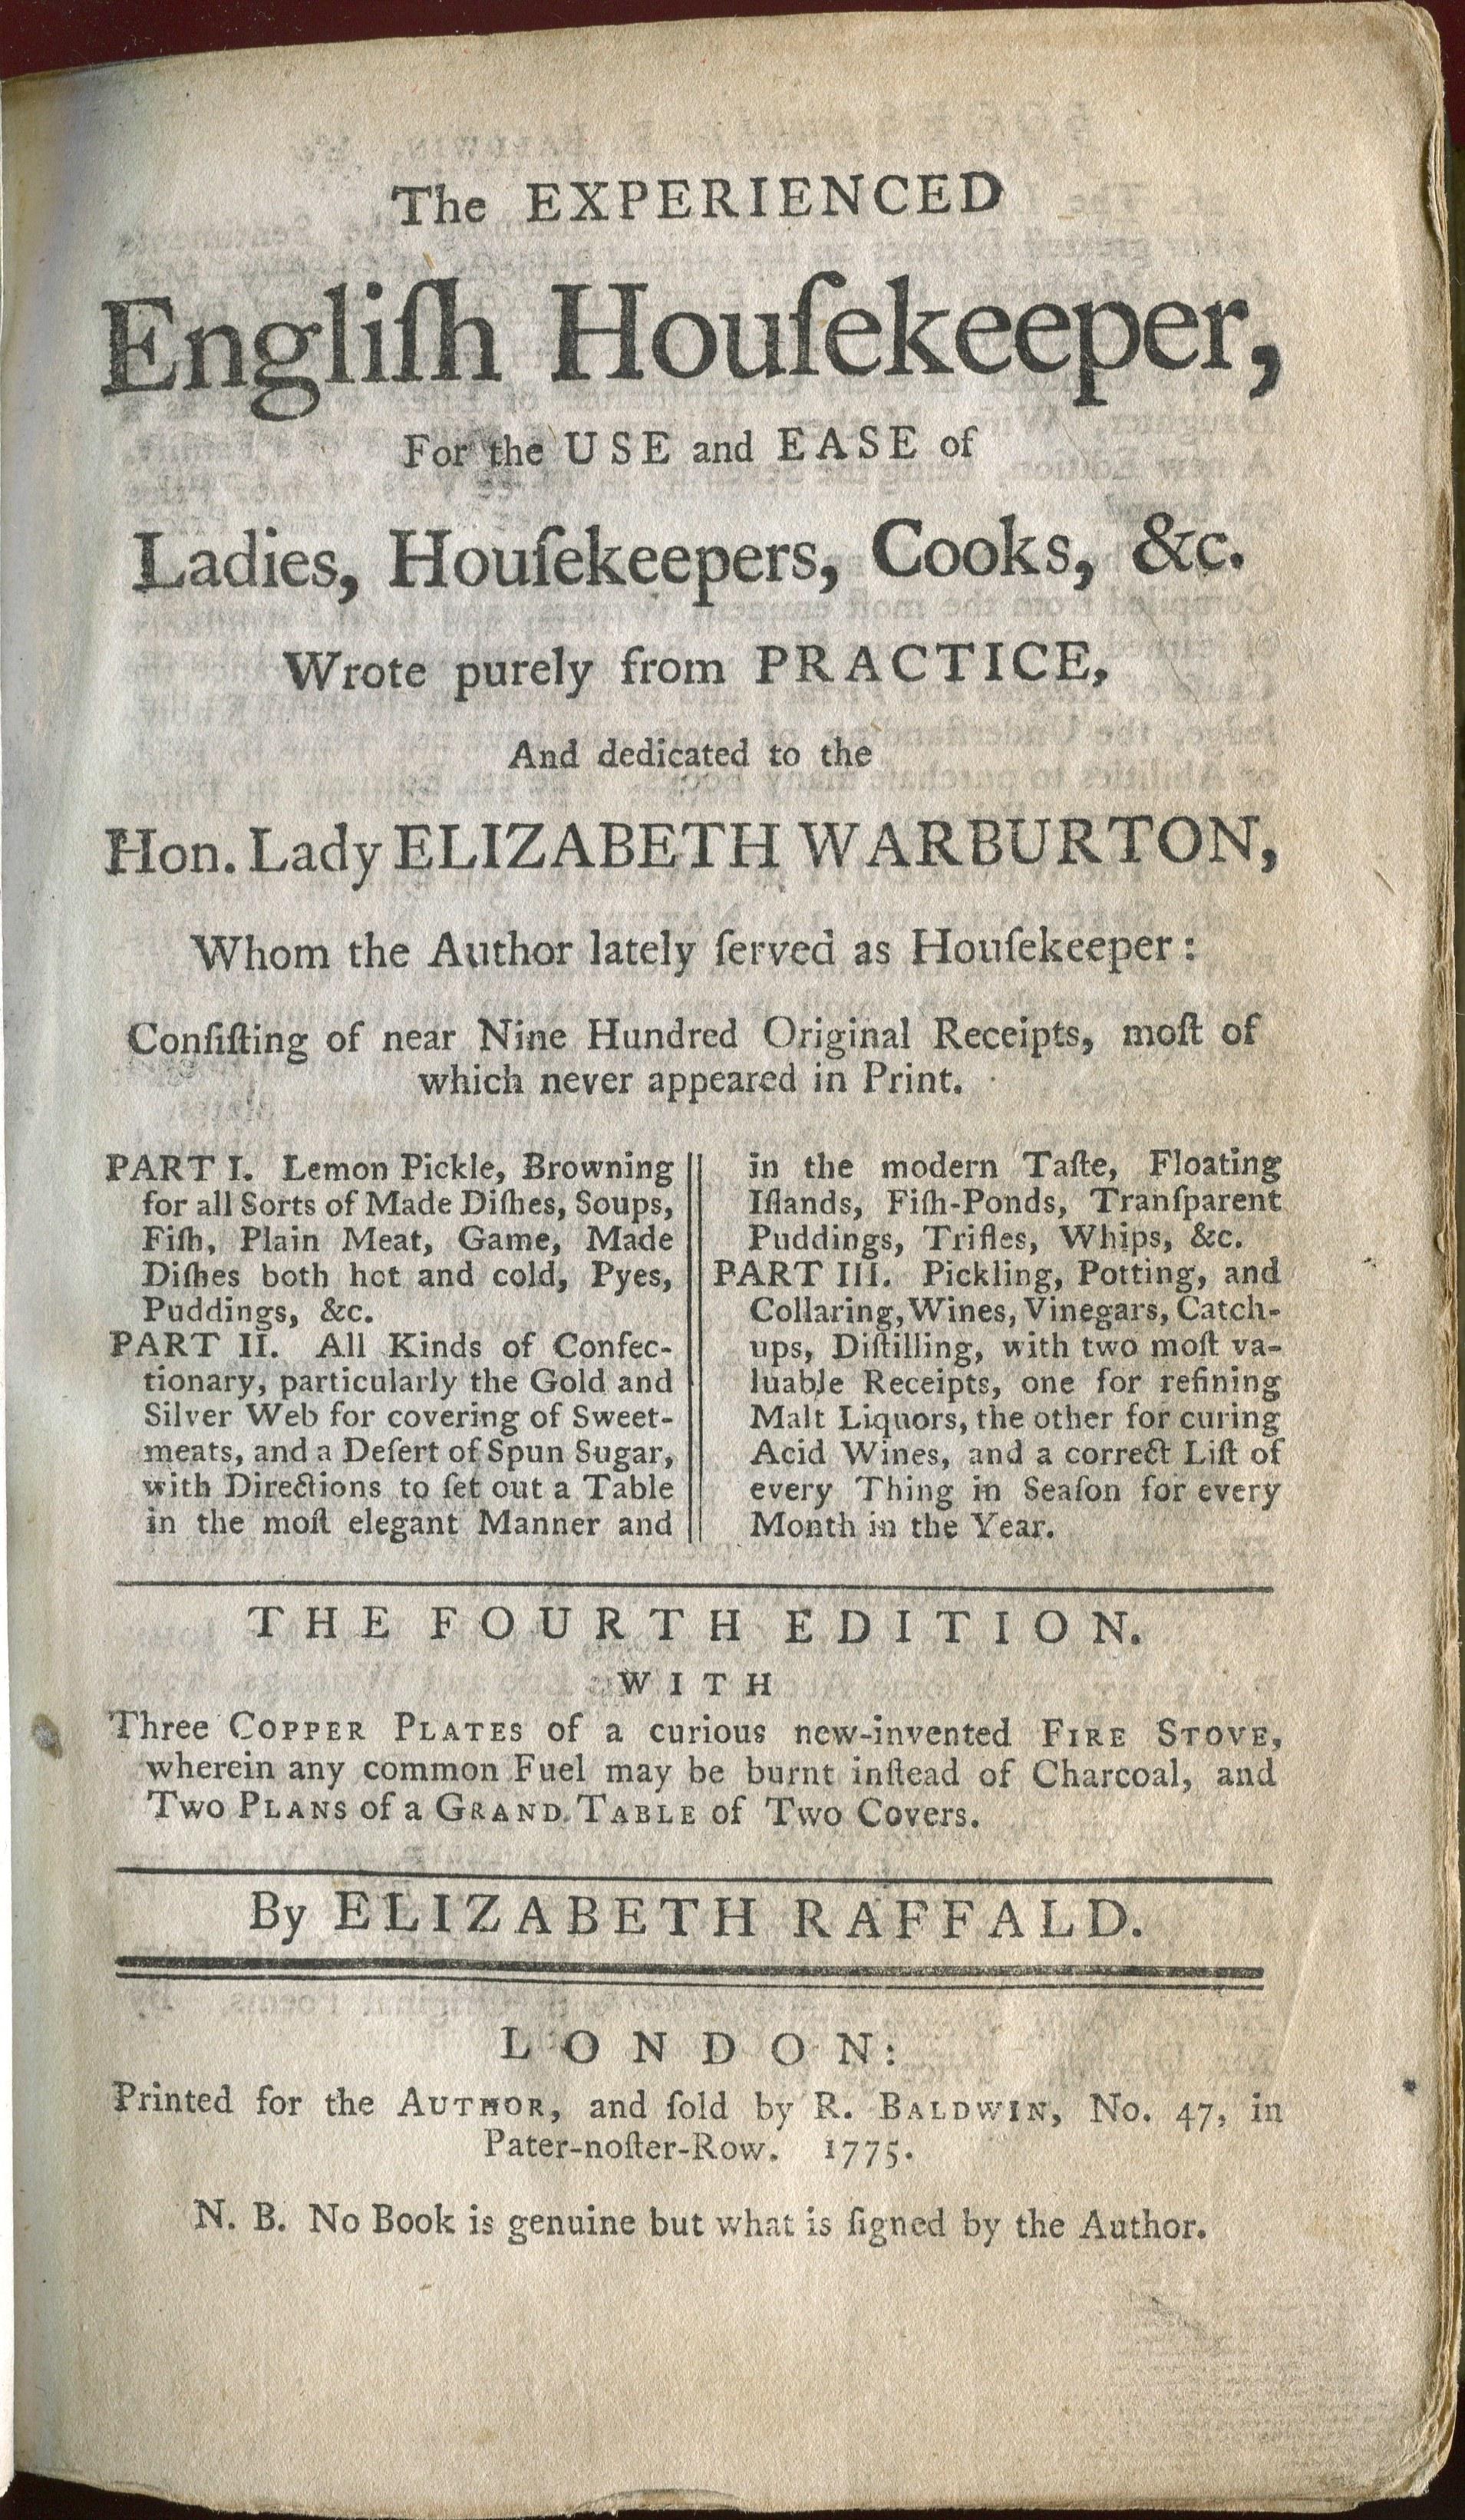 The Experienced English Housekeeper - Wikipedia